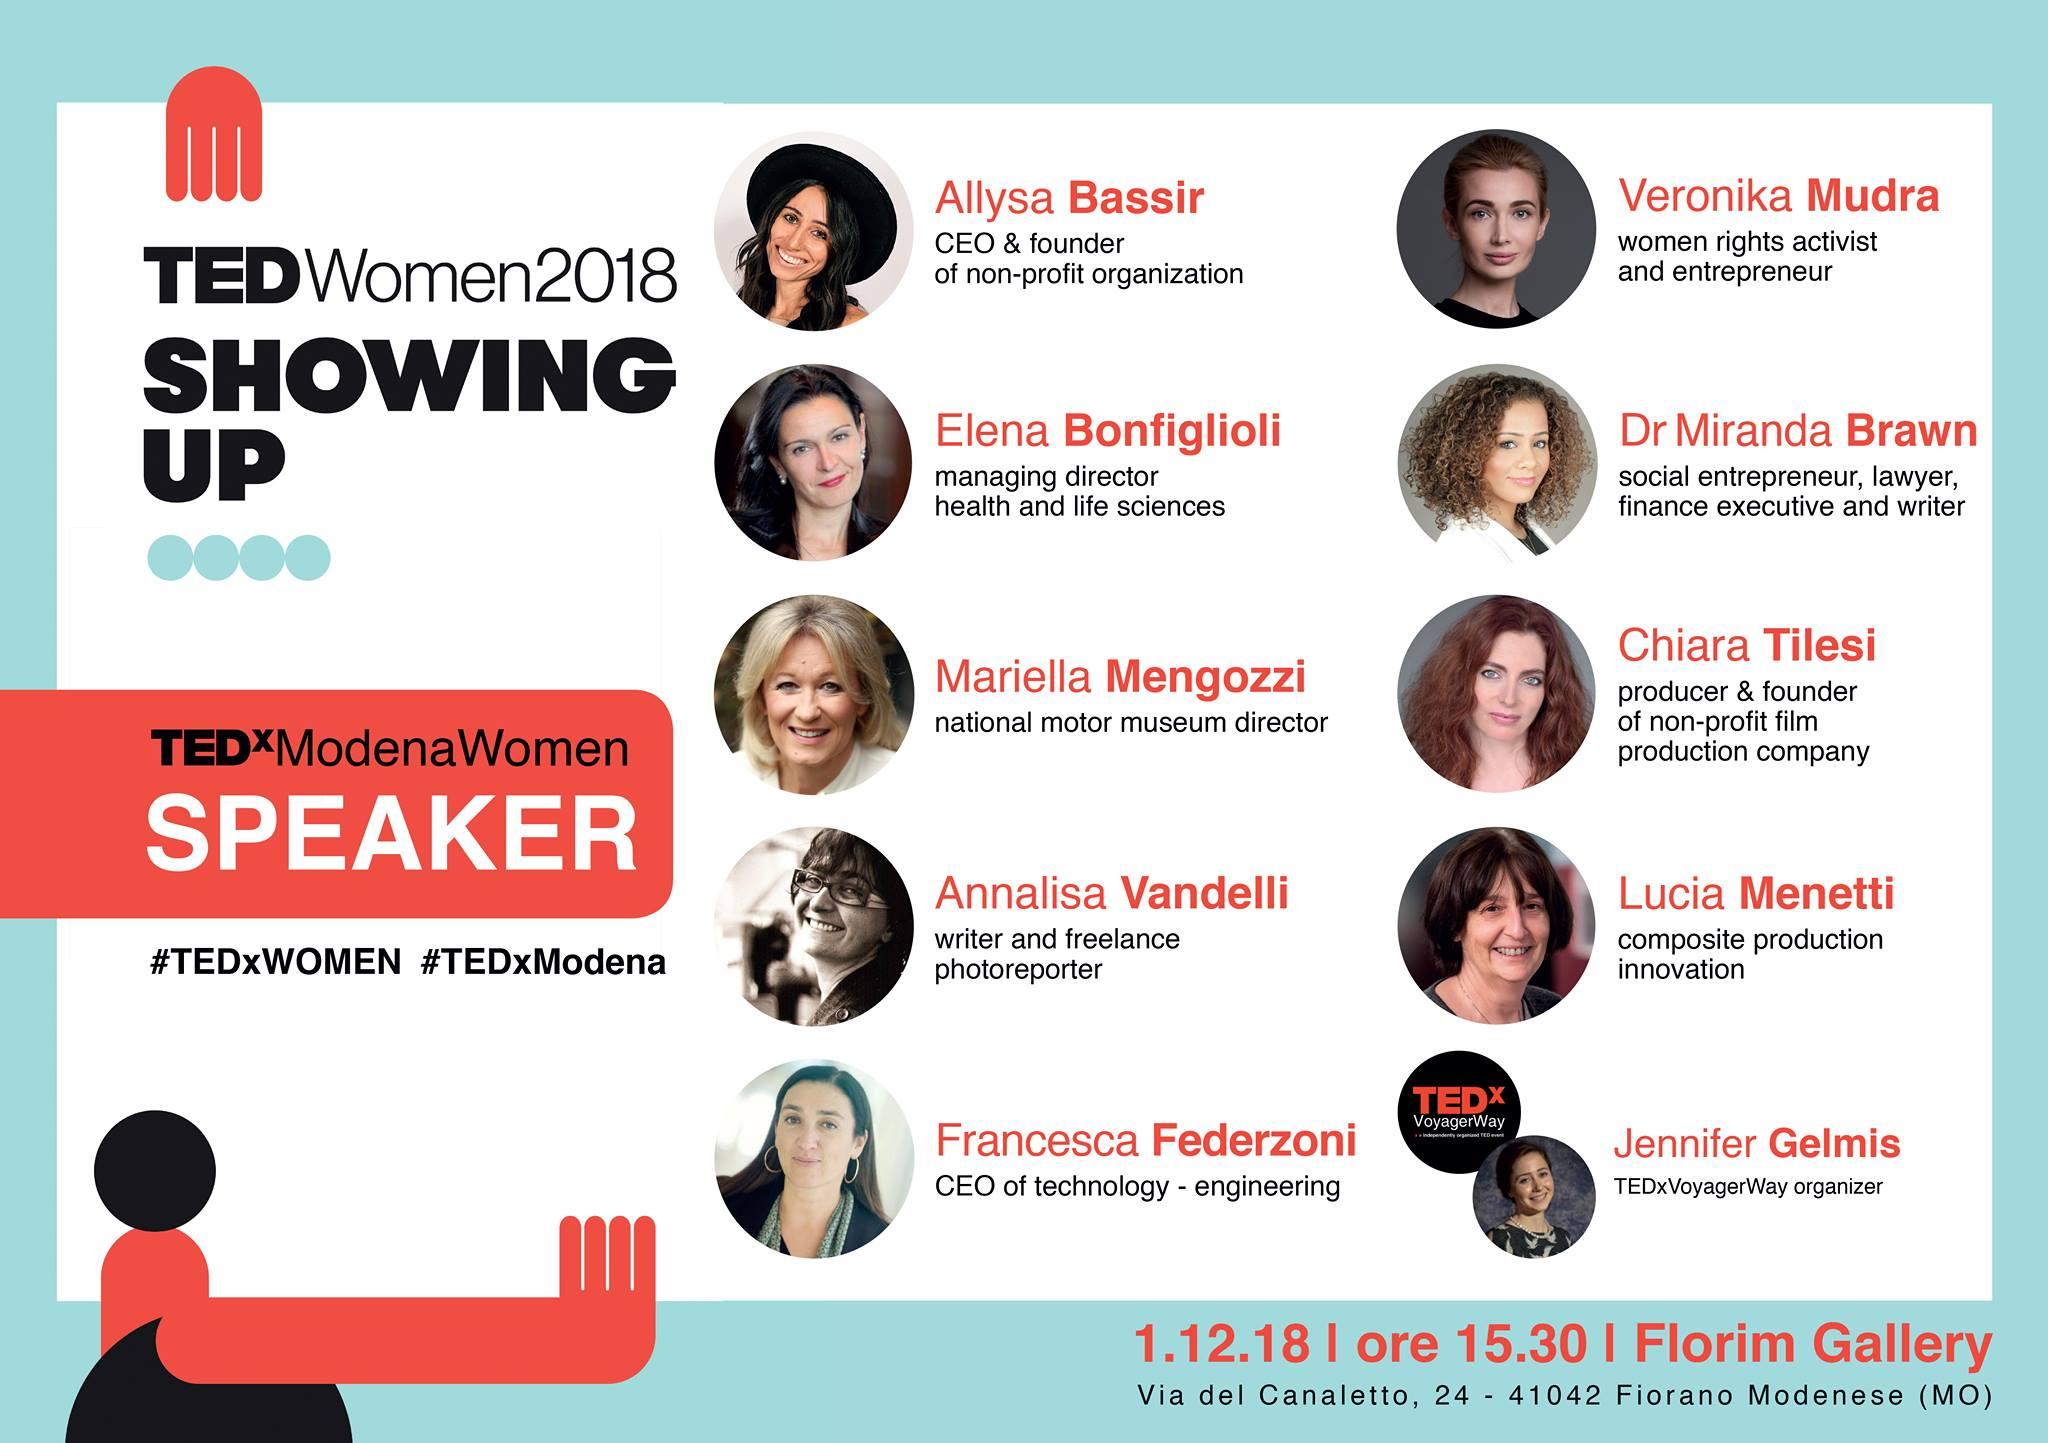 TEDxModenaWomen: Showing Up,sabato 1 dicembre ore 15.30. Fra le speaker l'Ing. Francesca Federzoni